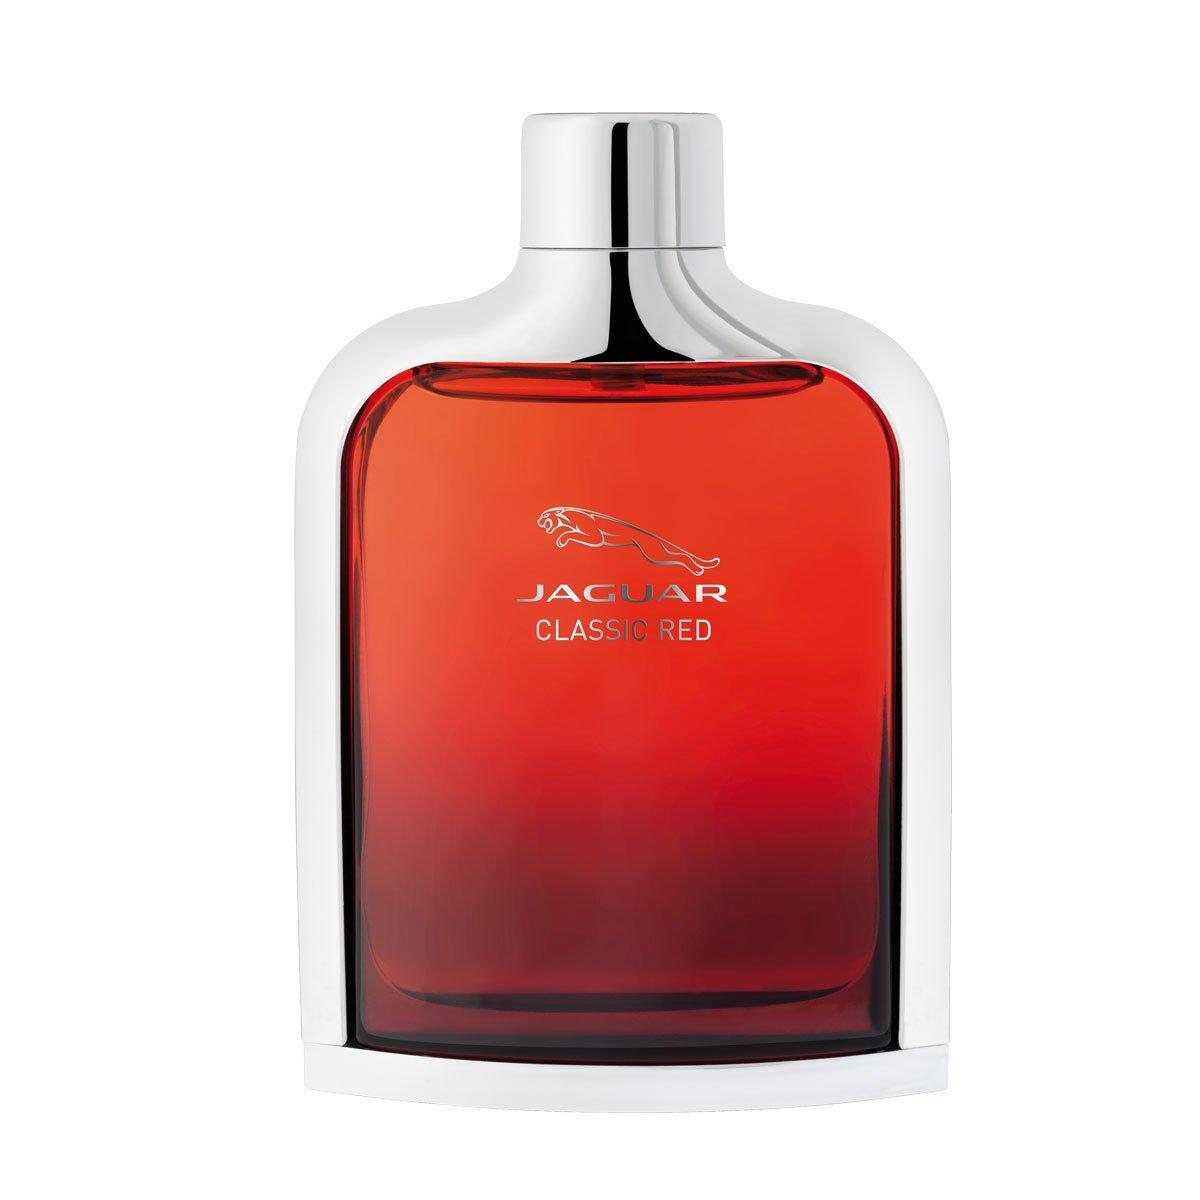 Jaguar Classic Red - (TESTER) toaletní voda Objem: 100 ml